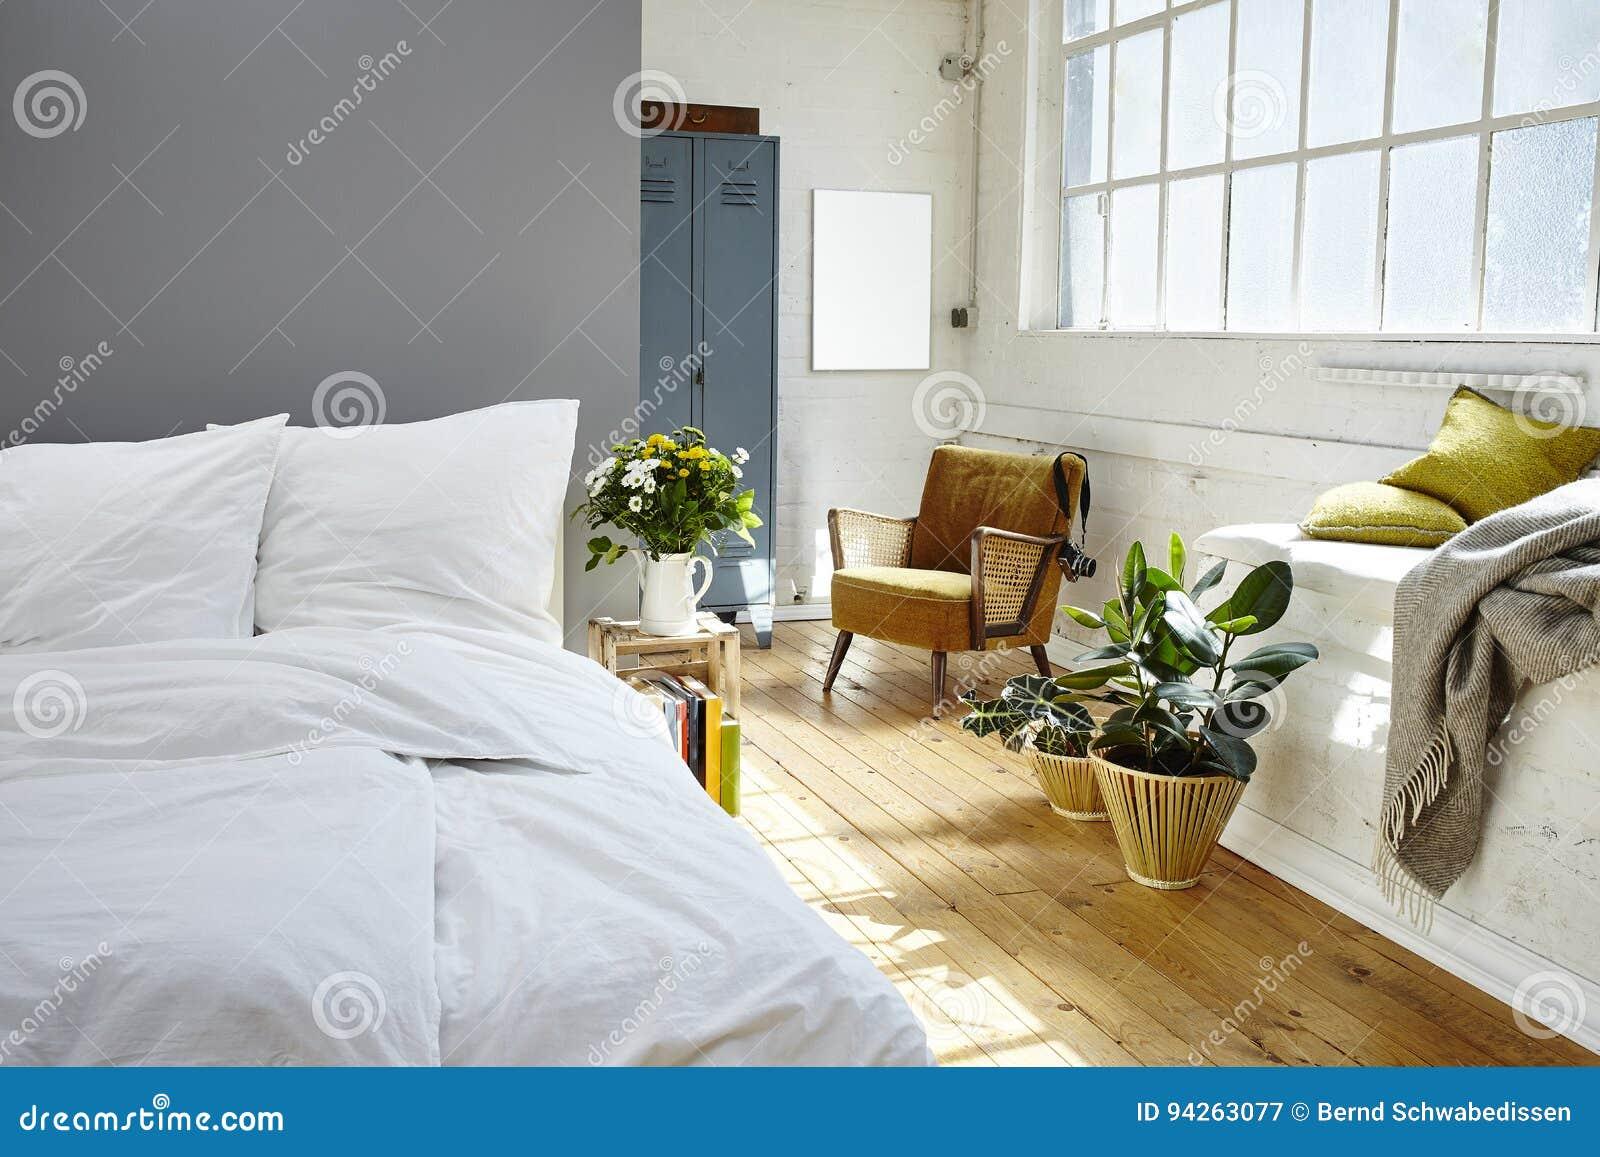 Vintage Bedroom Morning Light Industrial Loft Stock Image ...